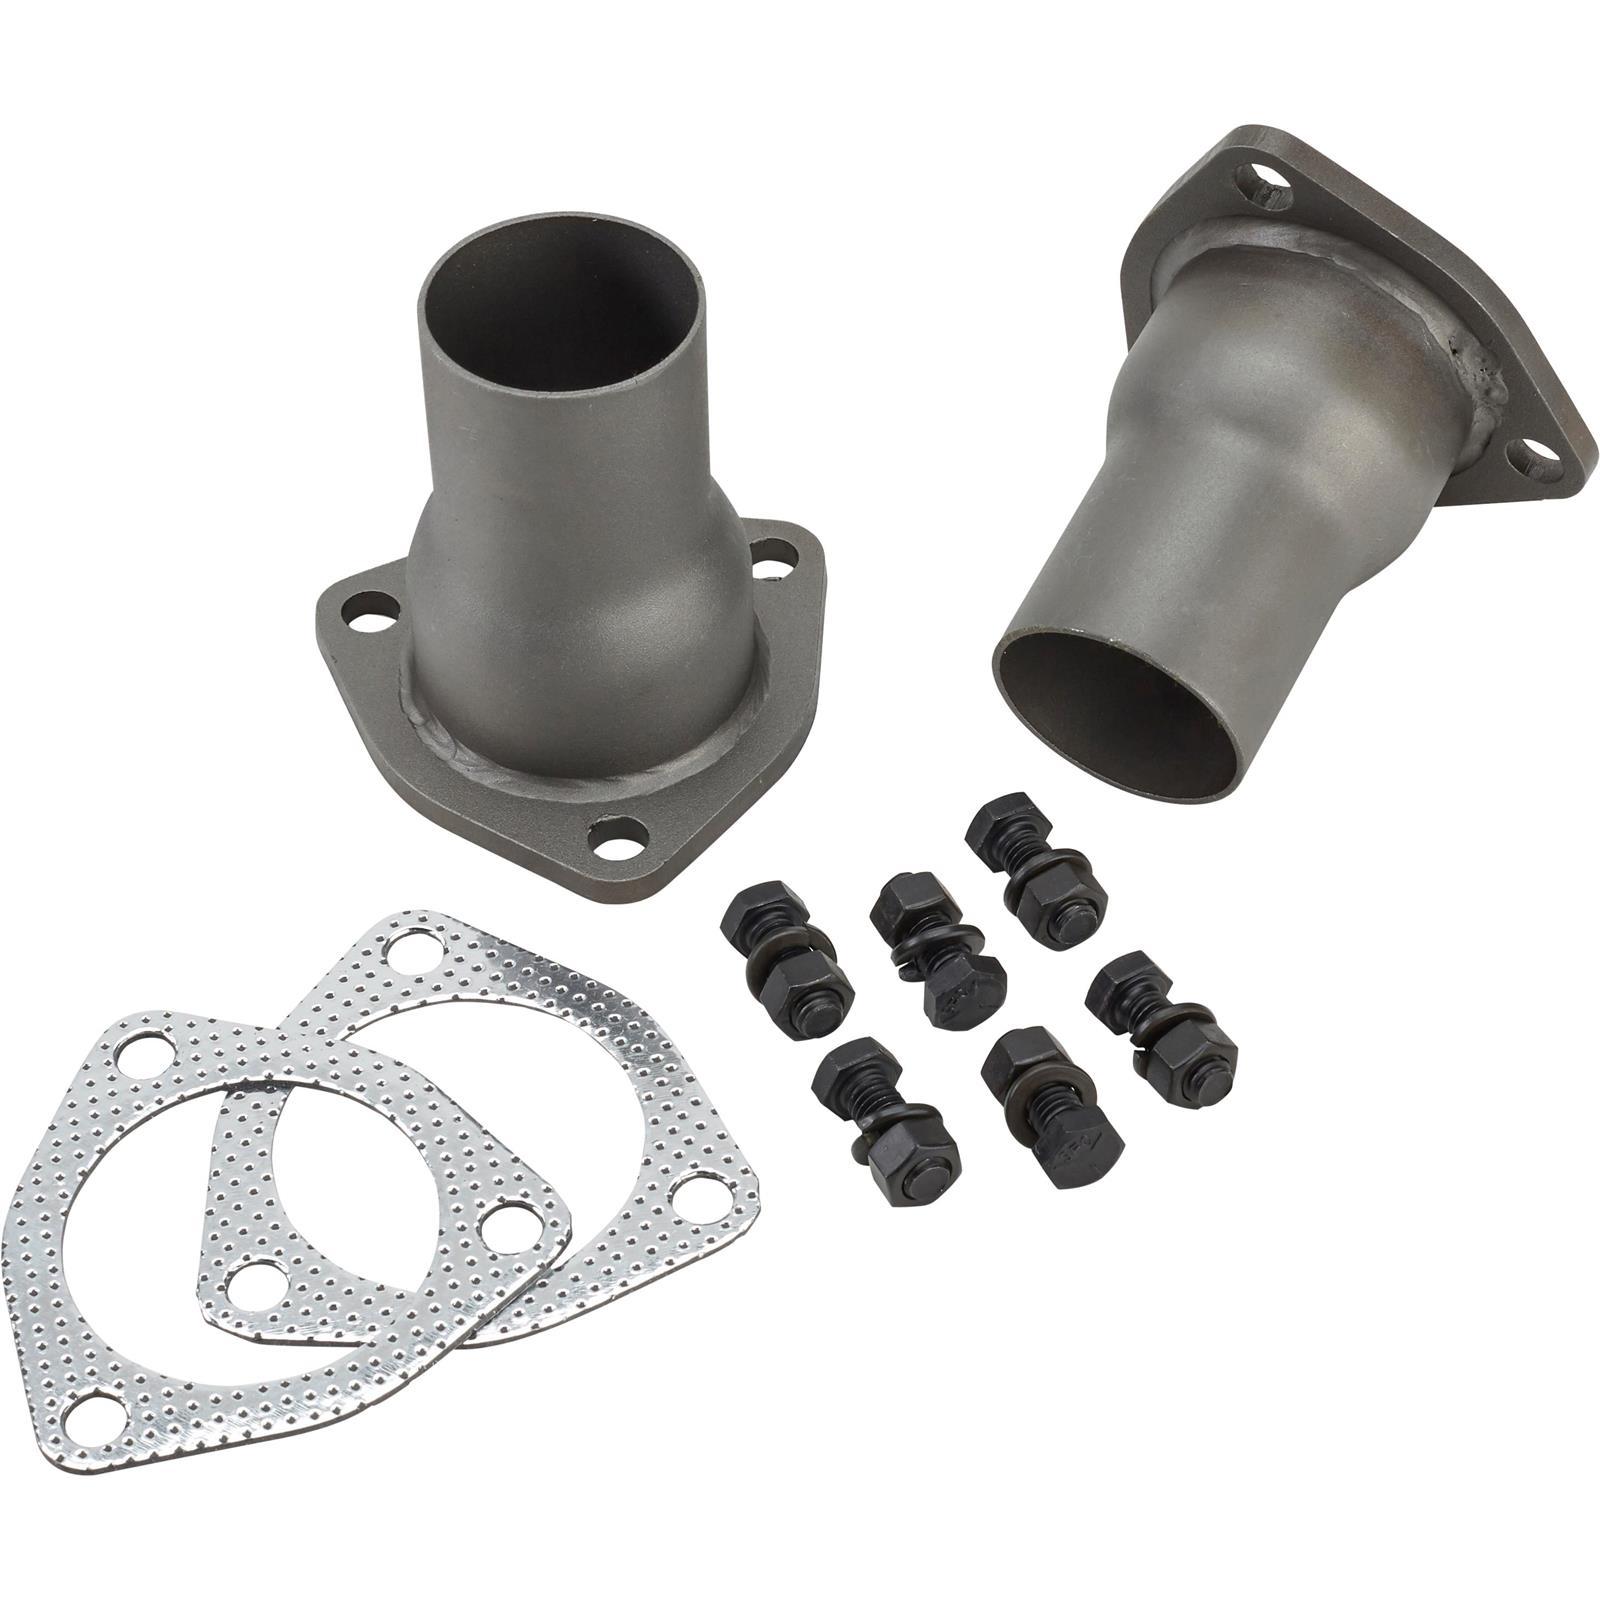 speedway 3 bolt header collector reducer kit 2 1 2 to 2 inch